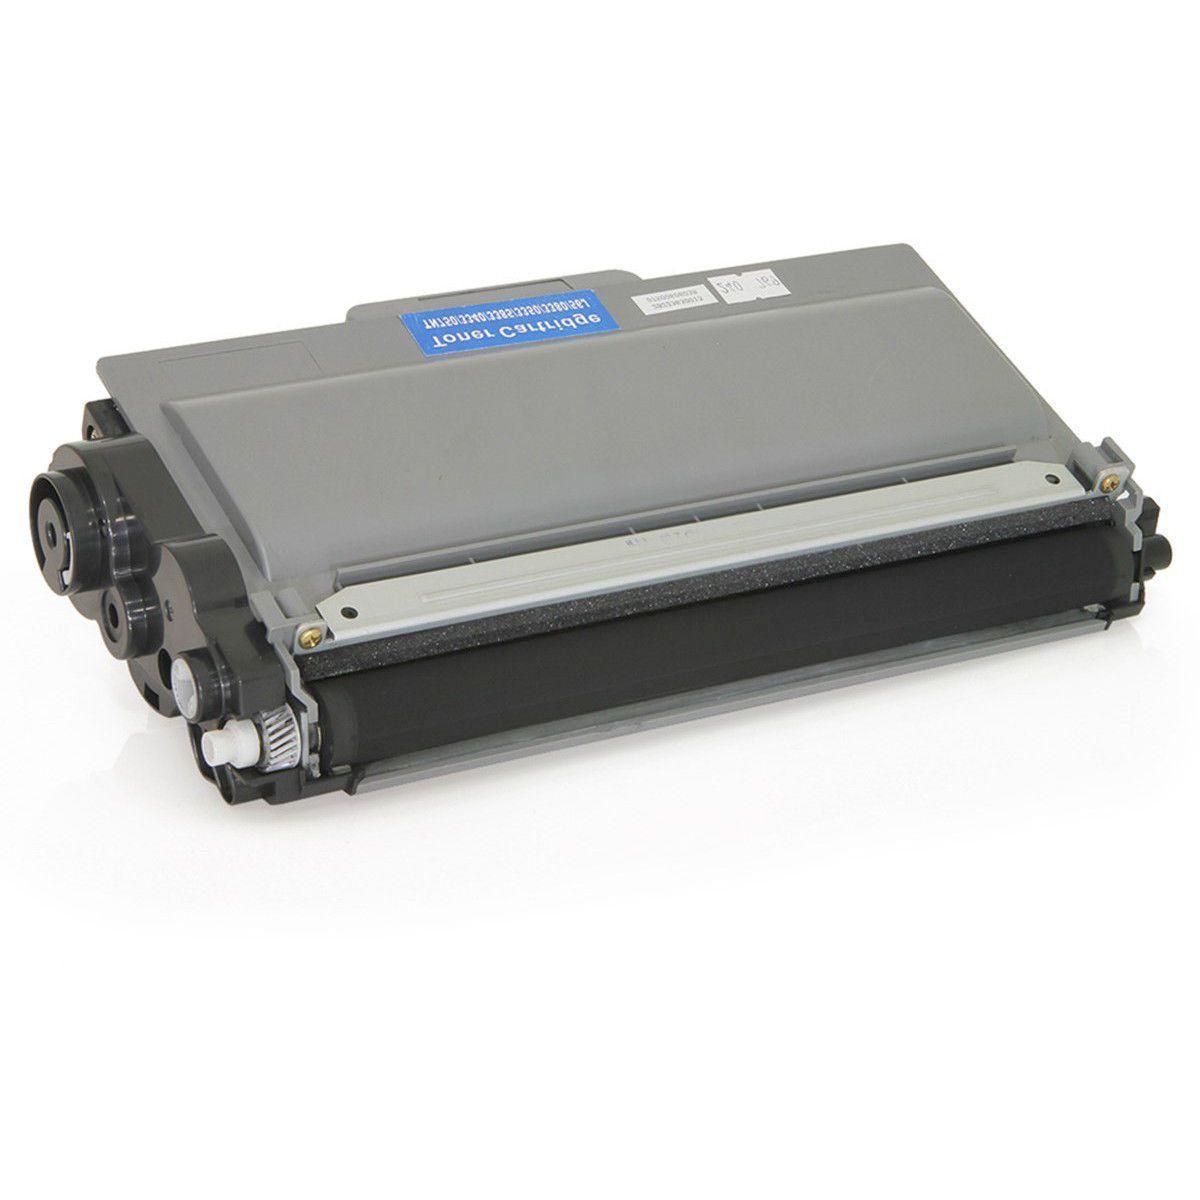 Compatível: Toner TN780 TN3392 para Brother HL-6180 DCP-8157 MFC-8950 HL-6182dw HL-6180dw DCP-8157dn / Preto / 12.000